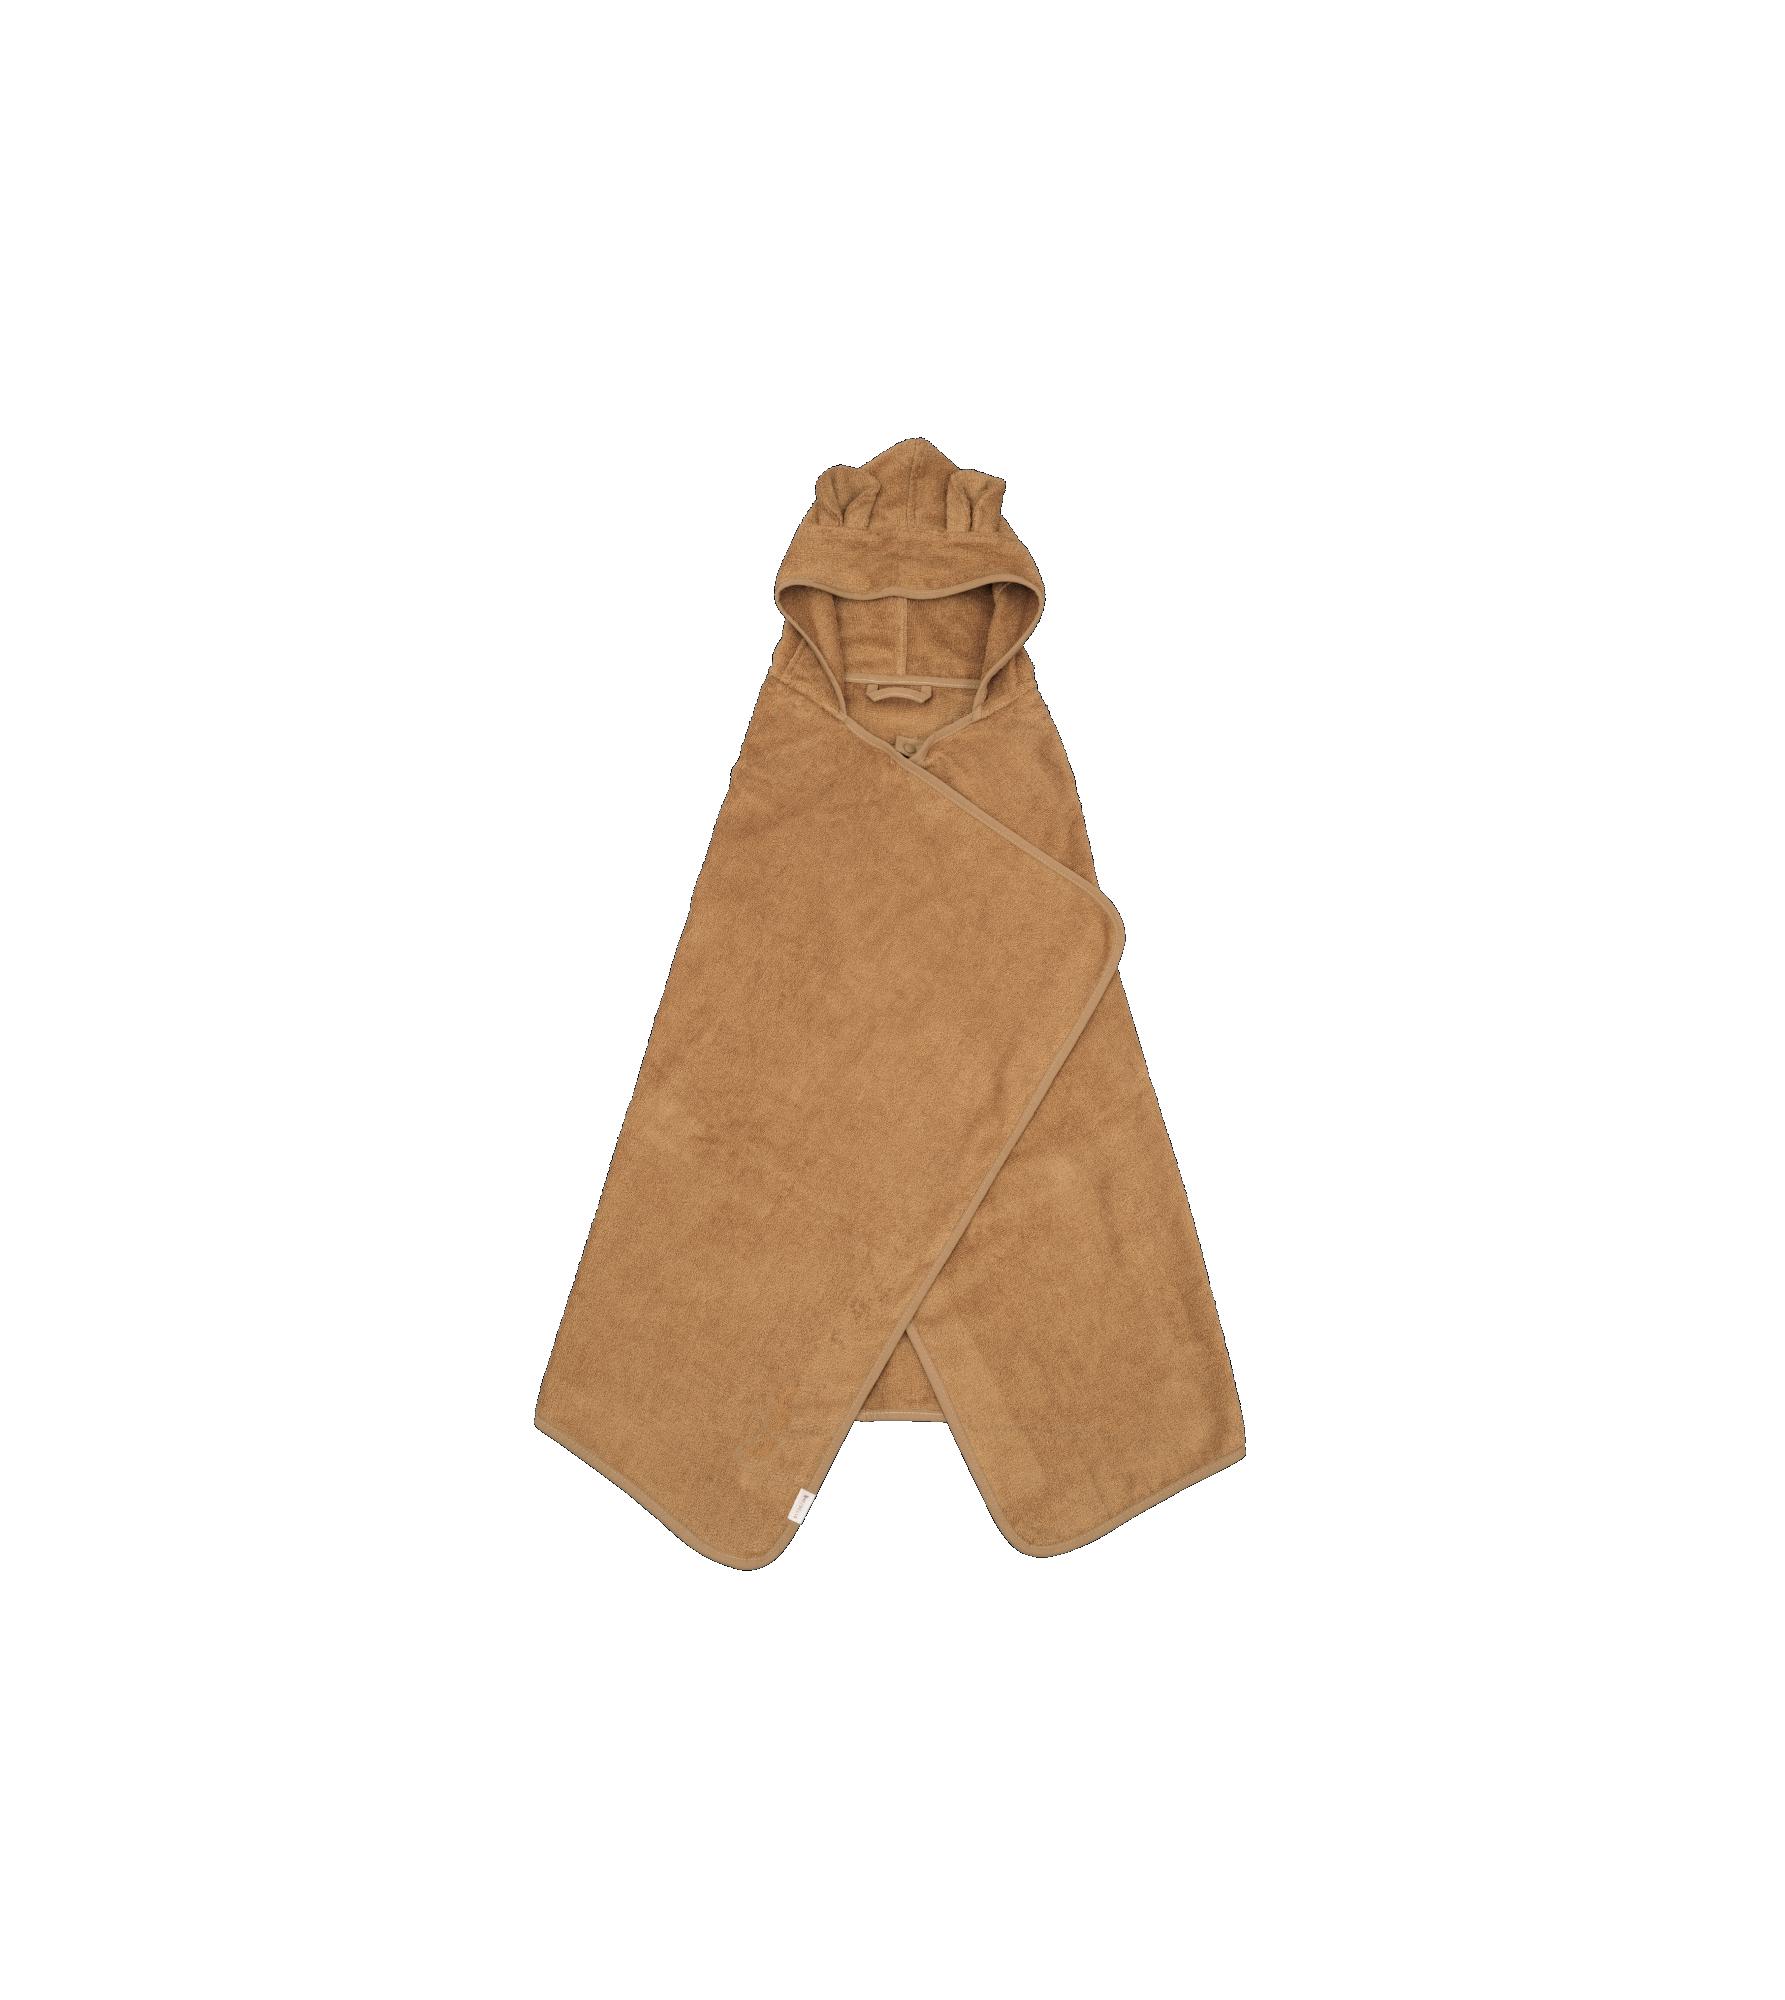 Hooded Junior Towel - Bear - Ochre (primary)_edit.png